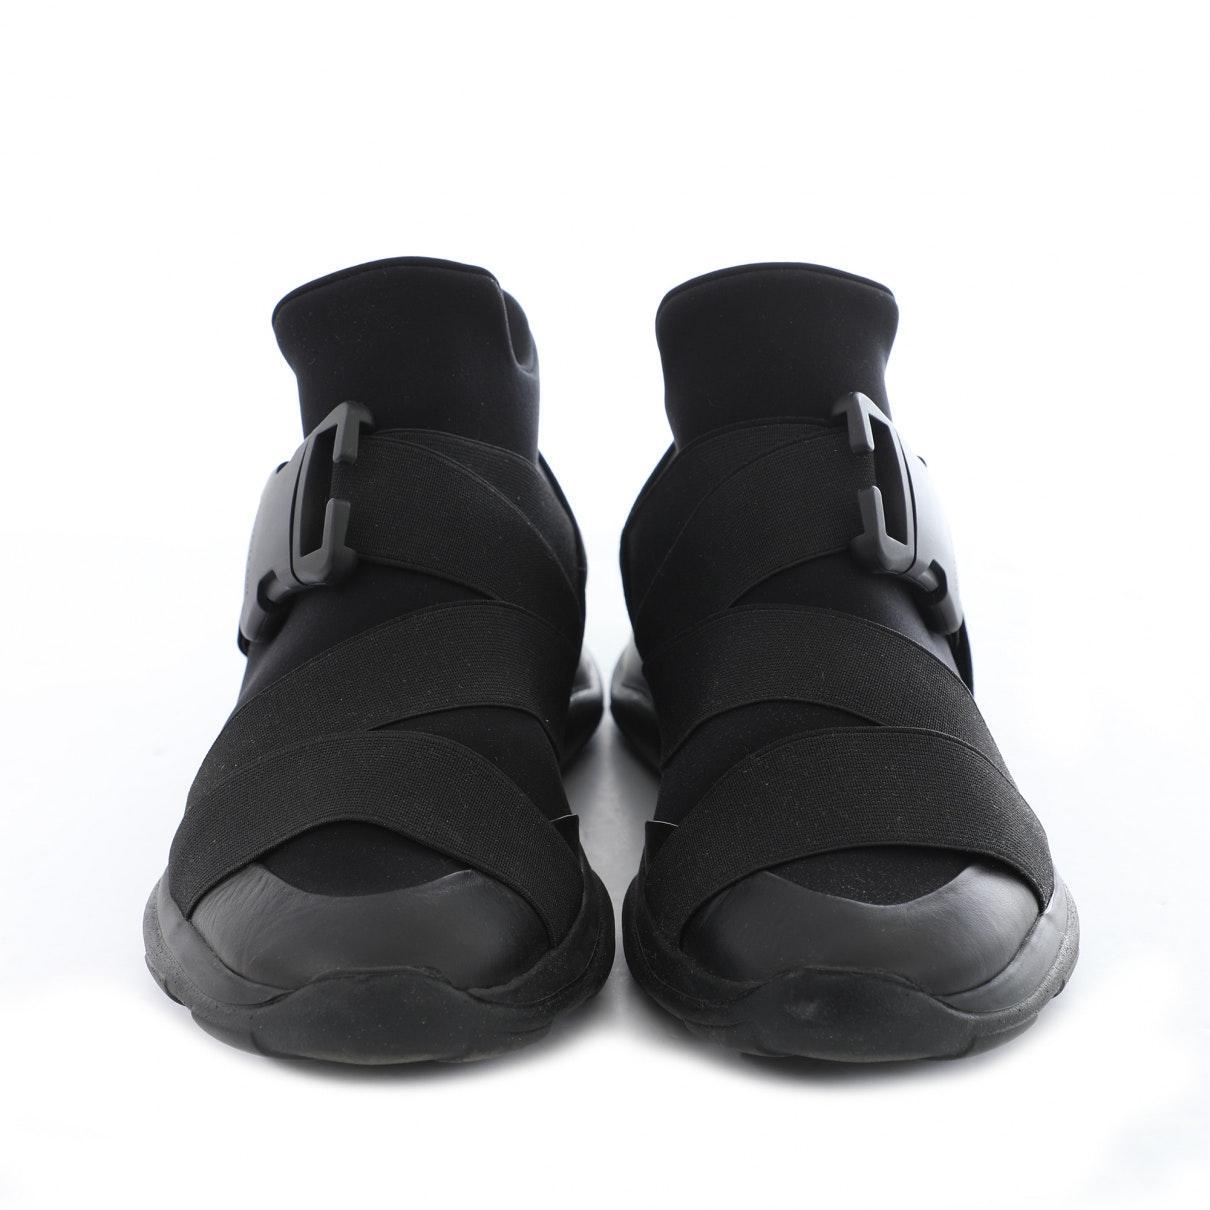 Deportivas en lona negro Christopher Kane de Neopreno de color Negro